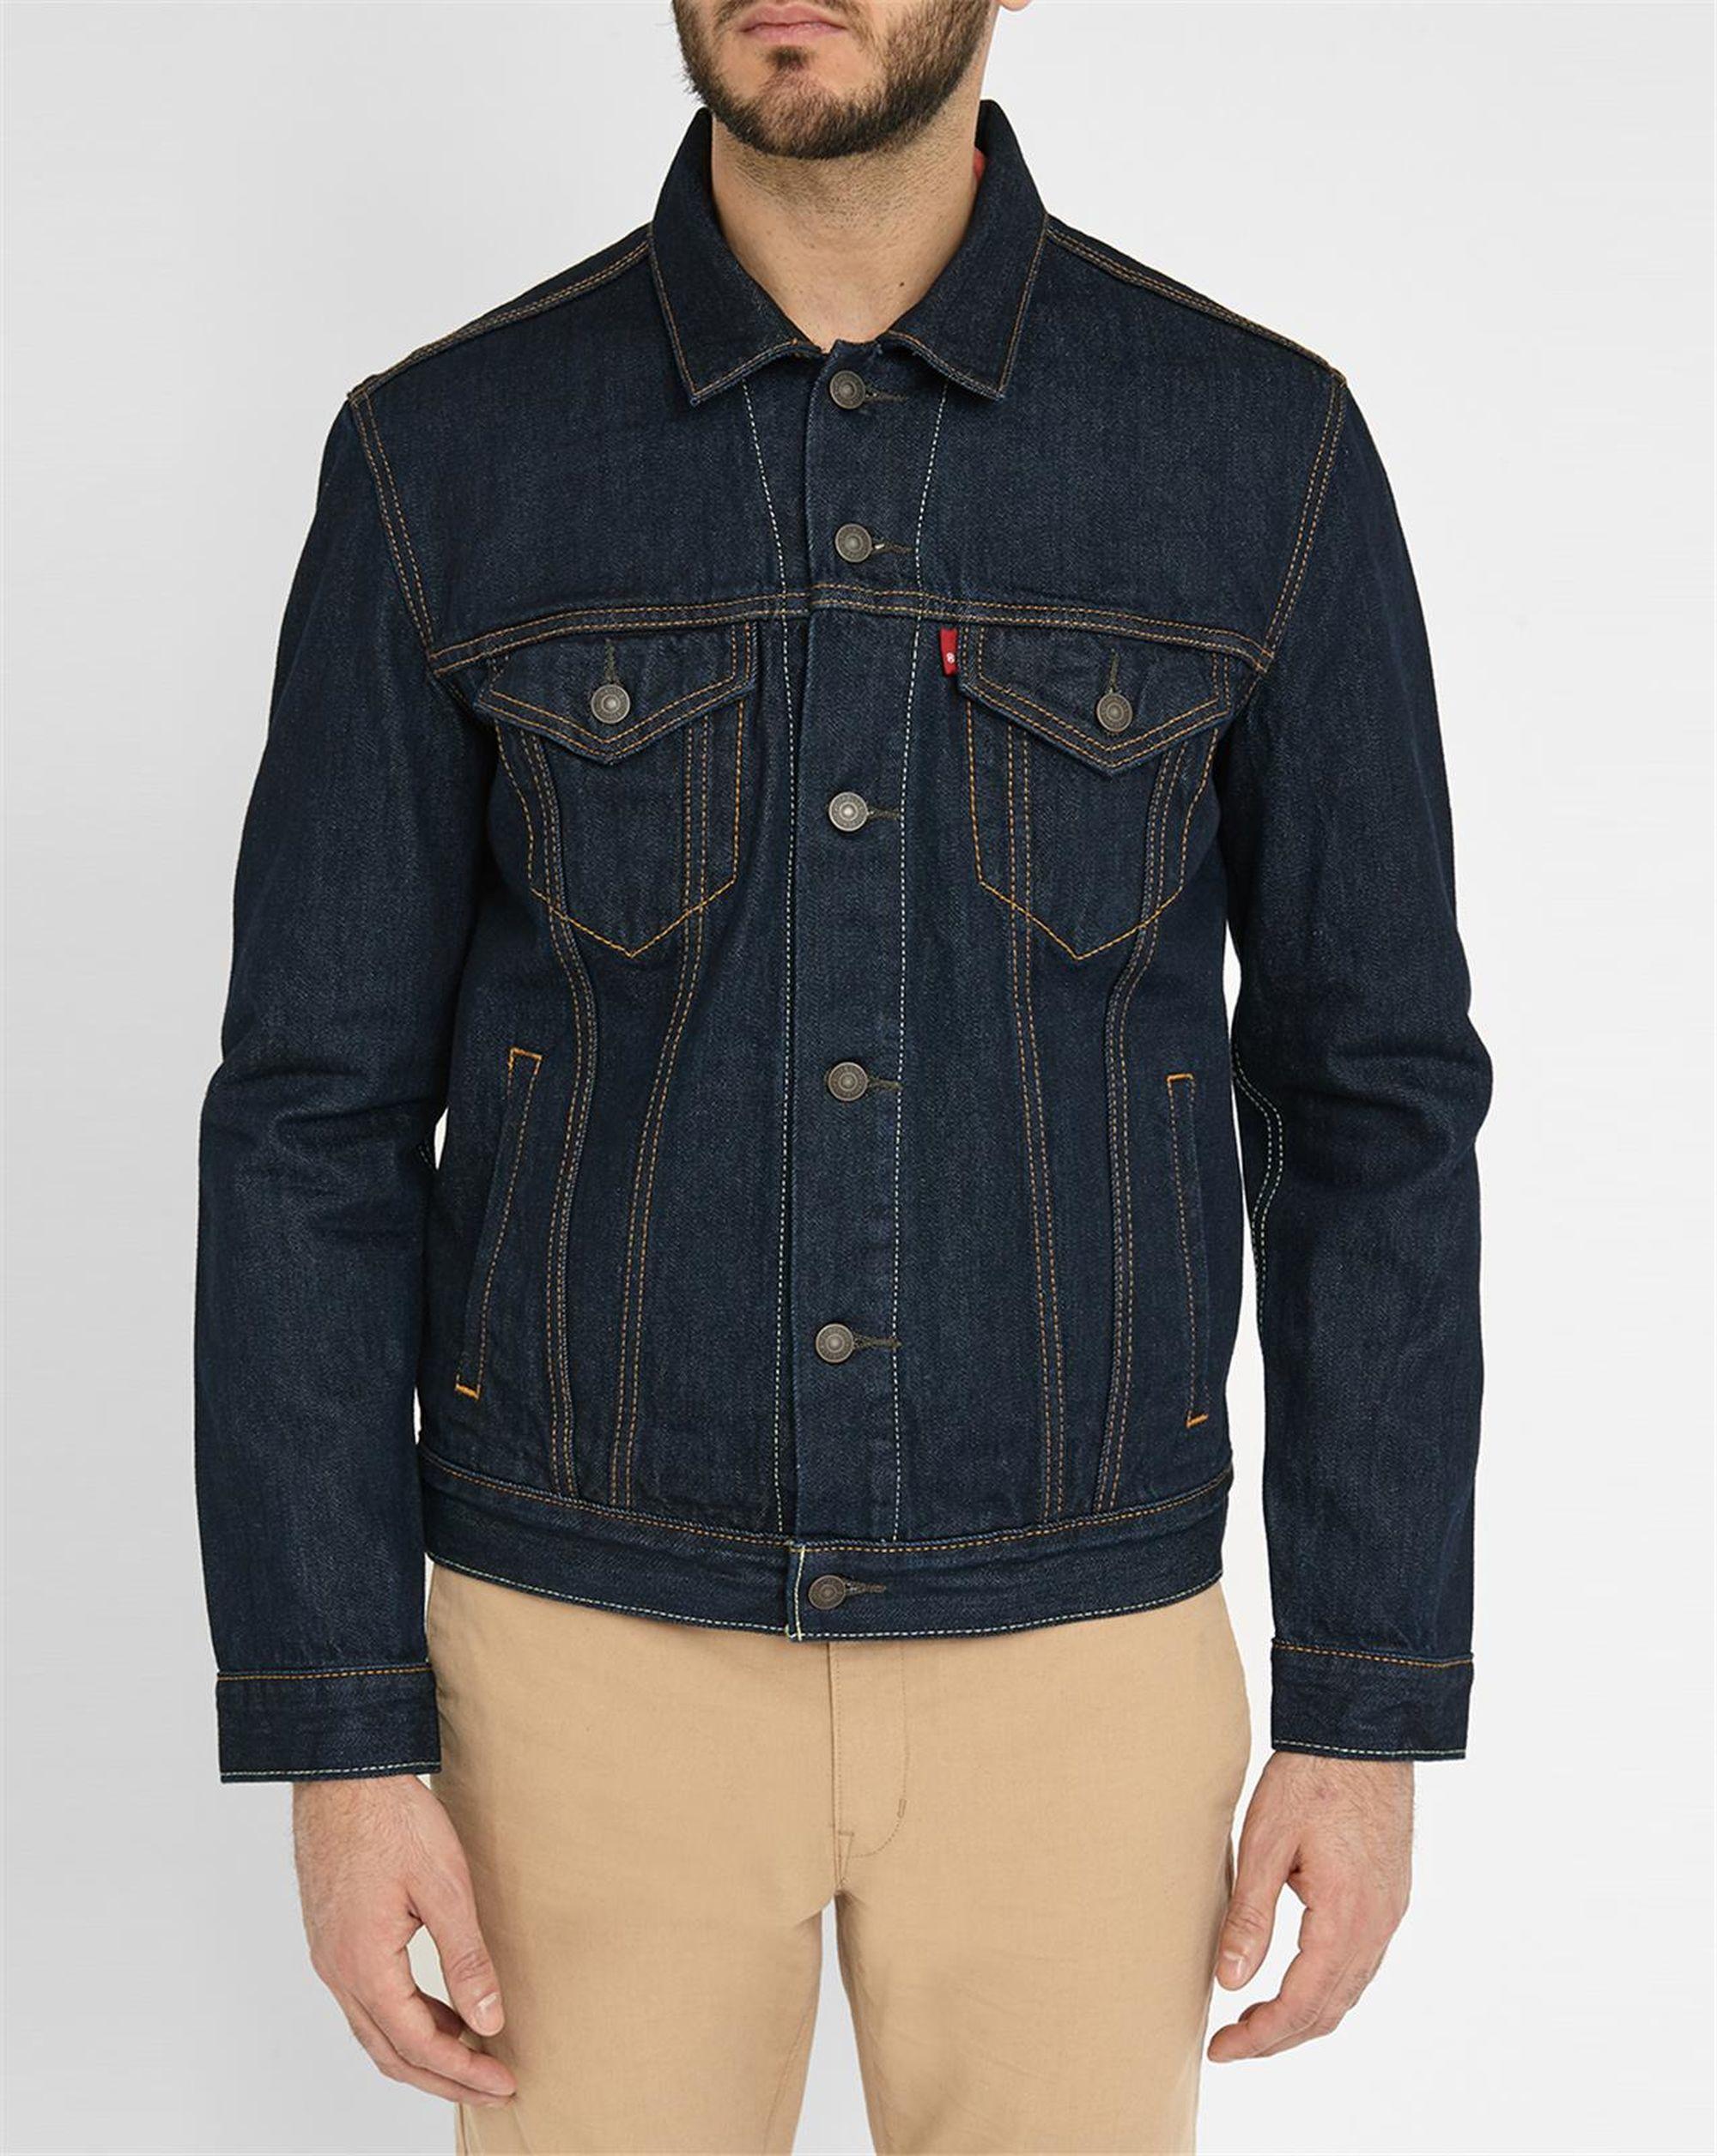 levi 39 s dark denim trucker shirt in blue for men lyst. Black Bedroom Furniture Sets. Home Design Ideas